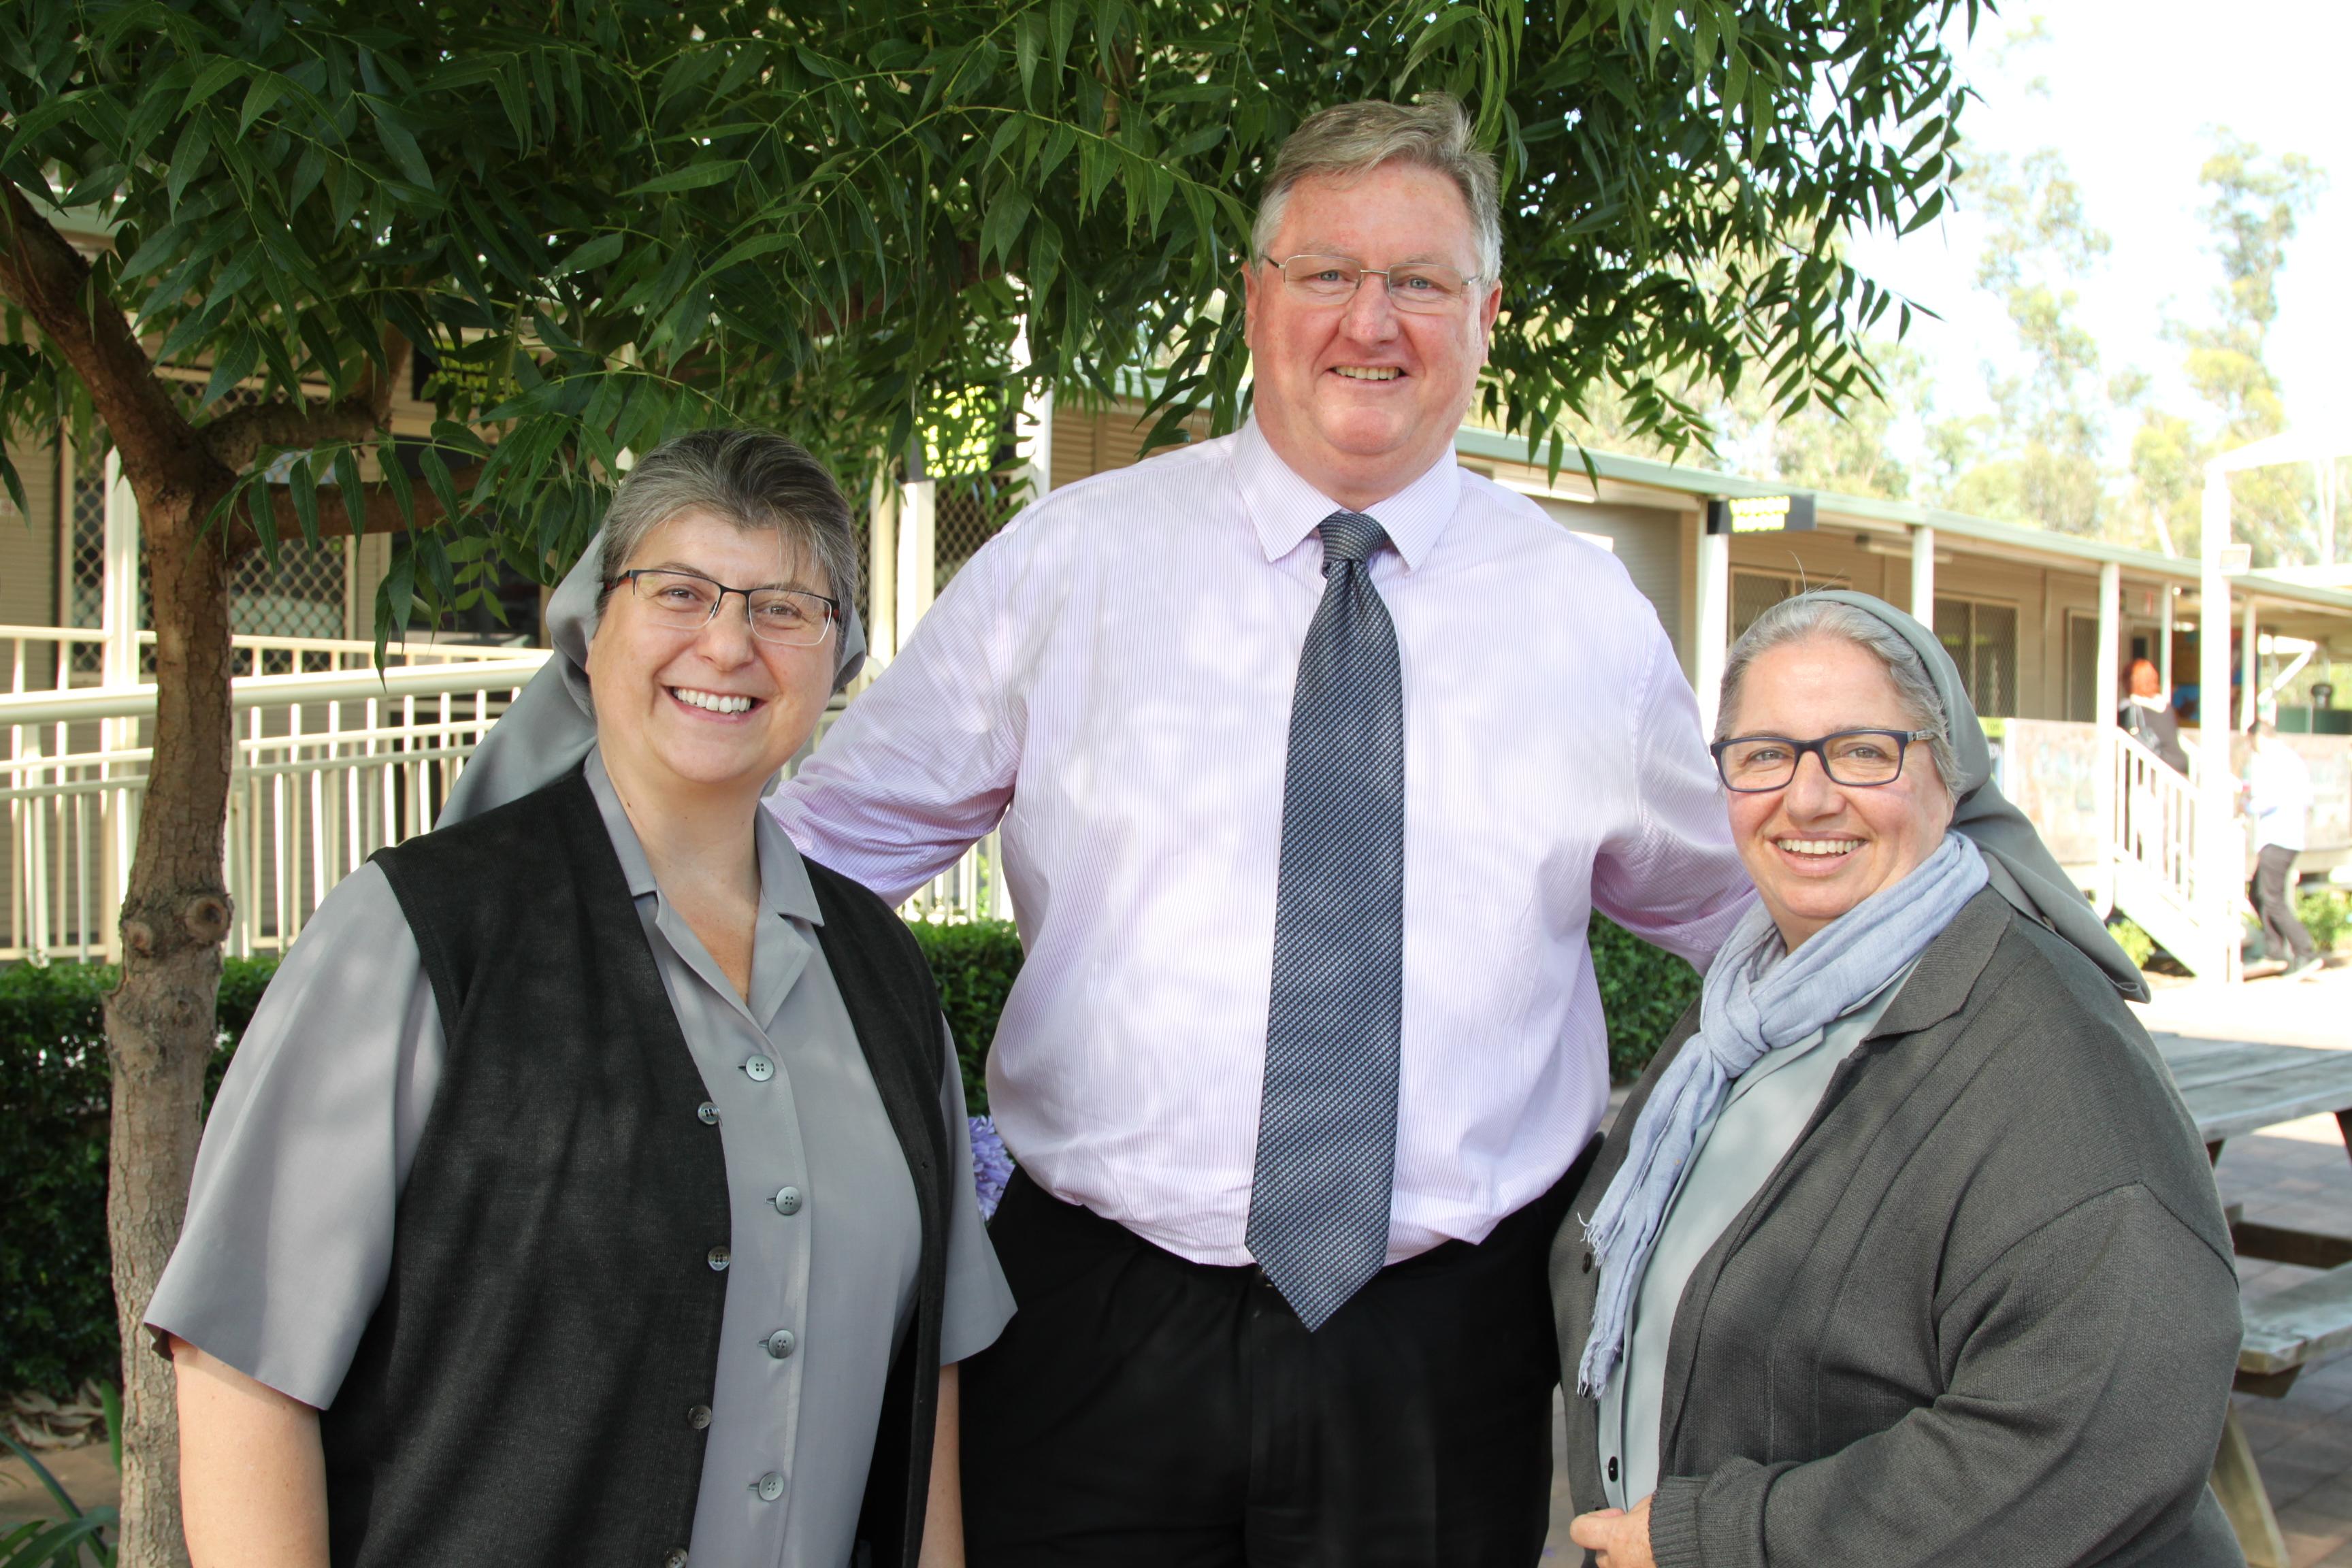 Con Greg Miller, Director de St Luke's Catholic College